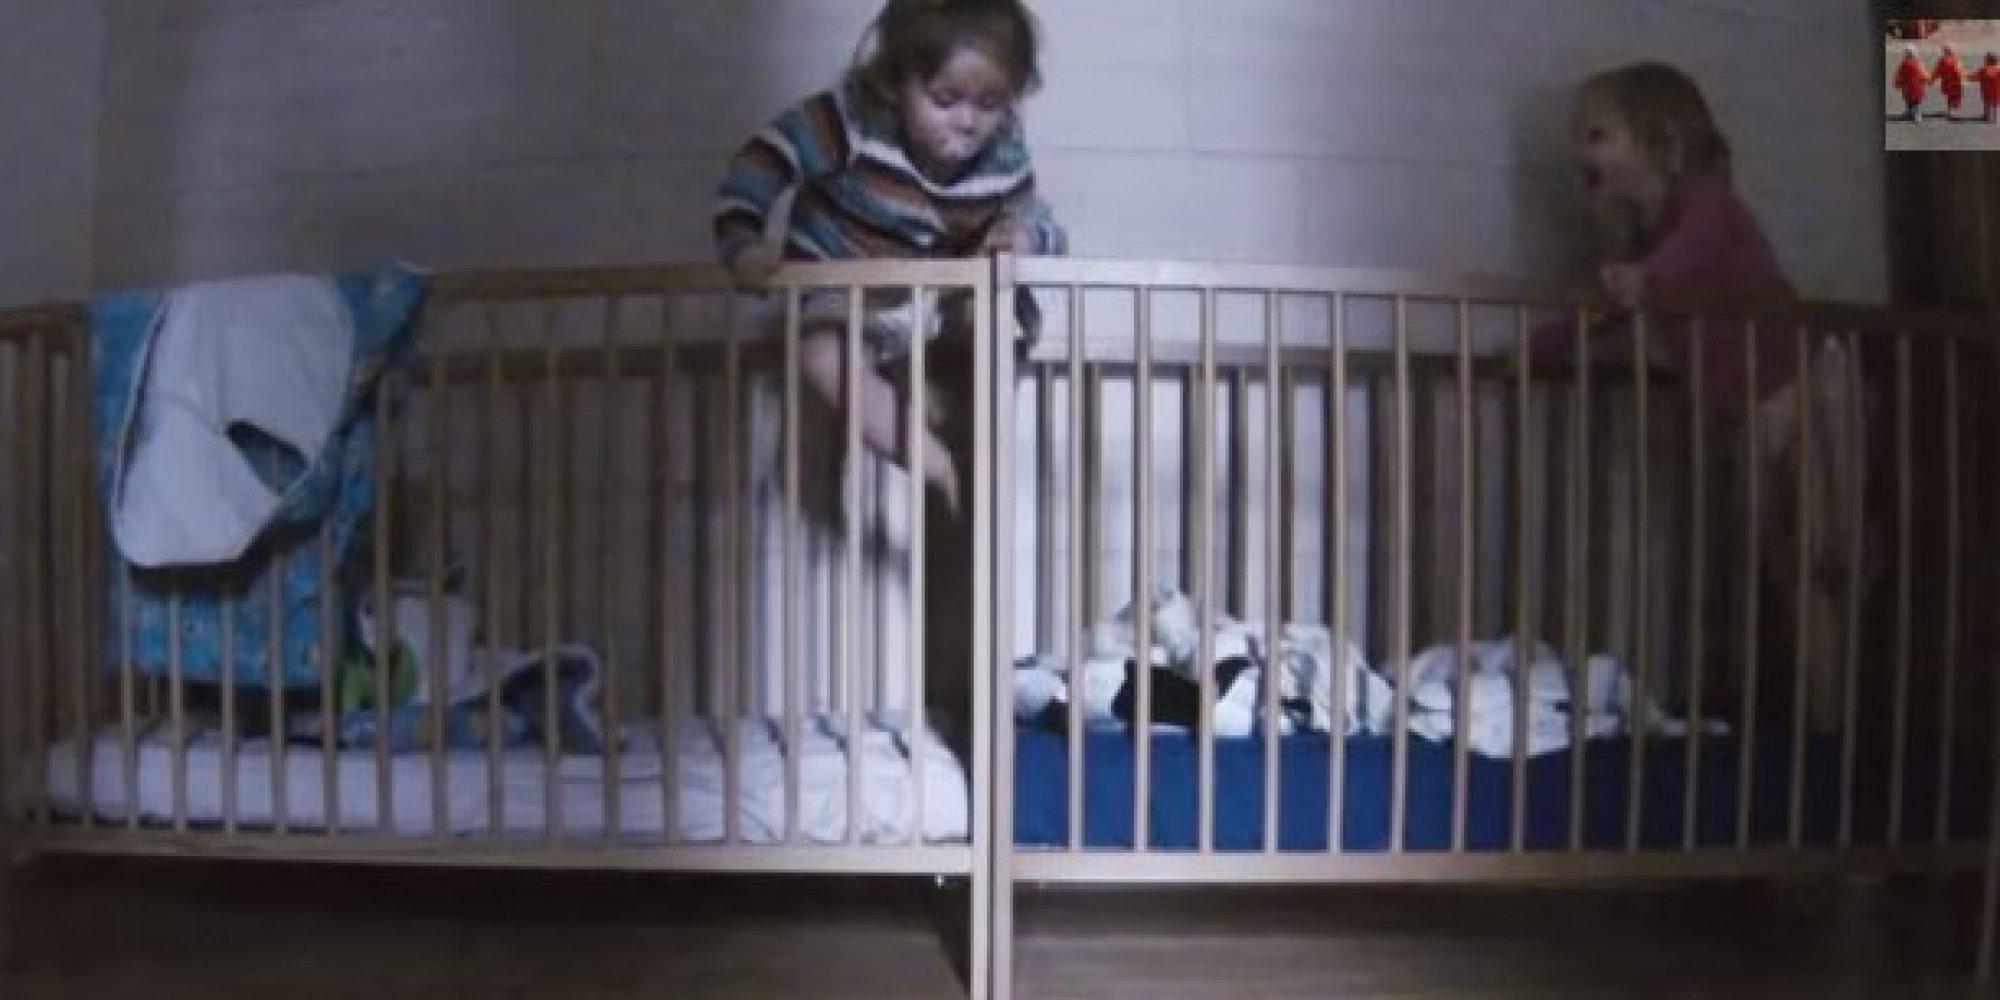 Baby bed for 2 year old - Baby Bed For 2 Year Old 54